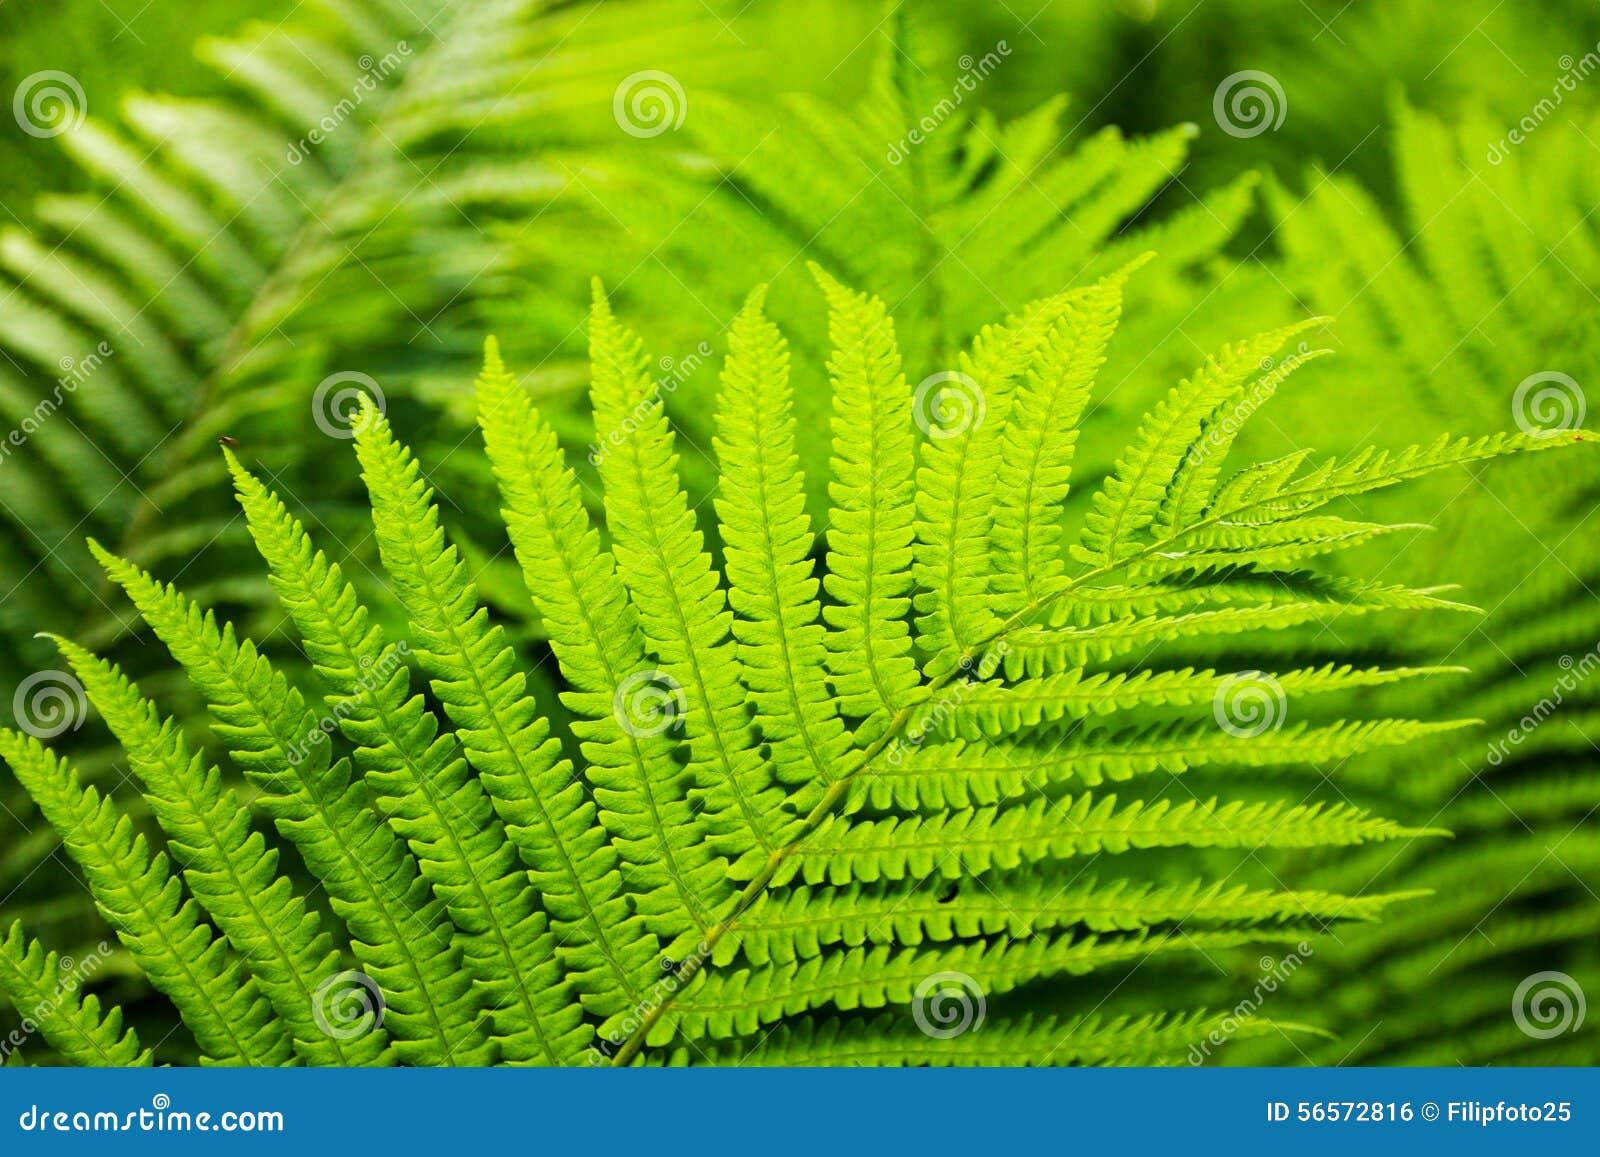 Download Πράσινη φτέρη στοκ εικόνες. εικόνα από μπούκλα, βοτανικό - 56572816